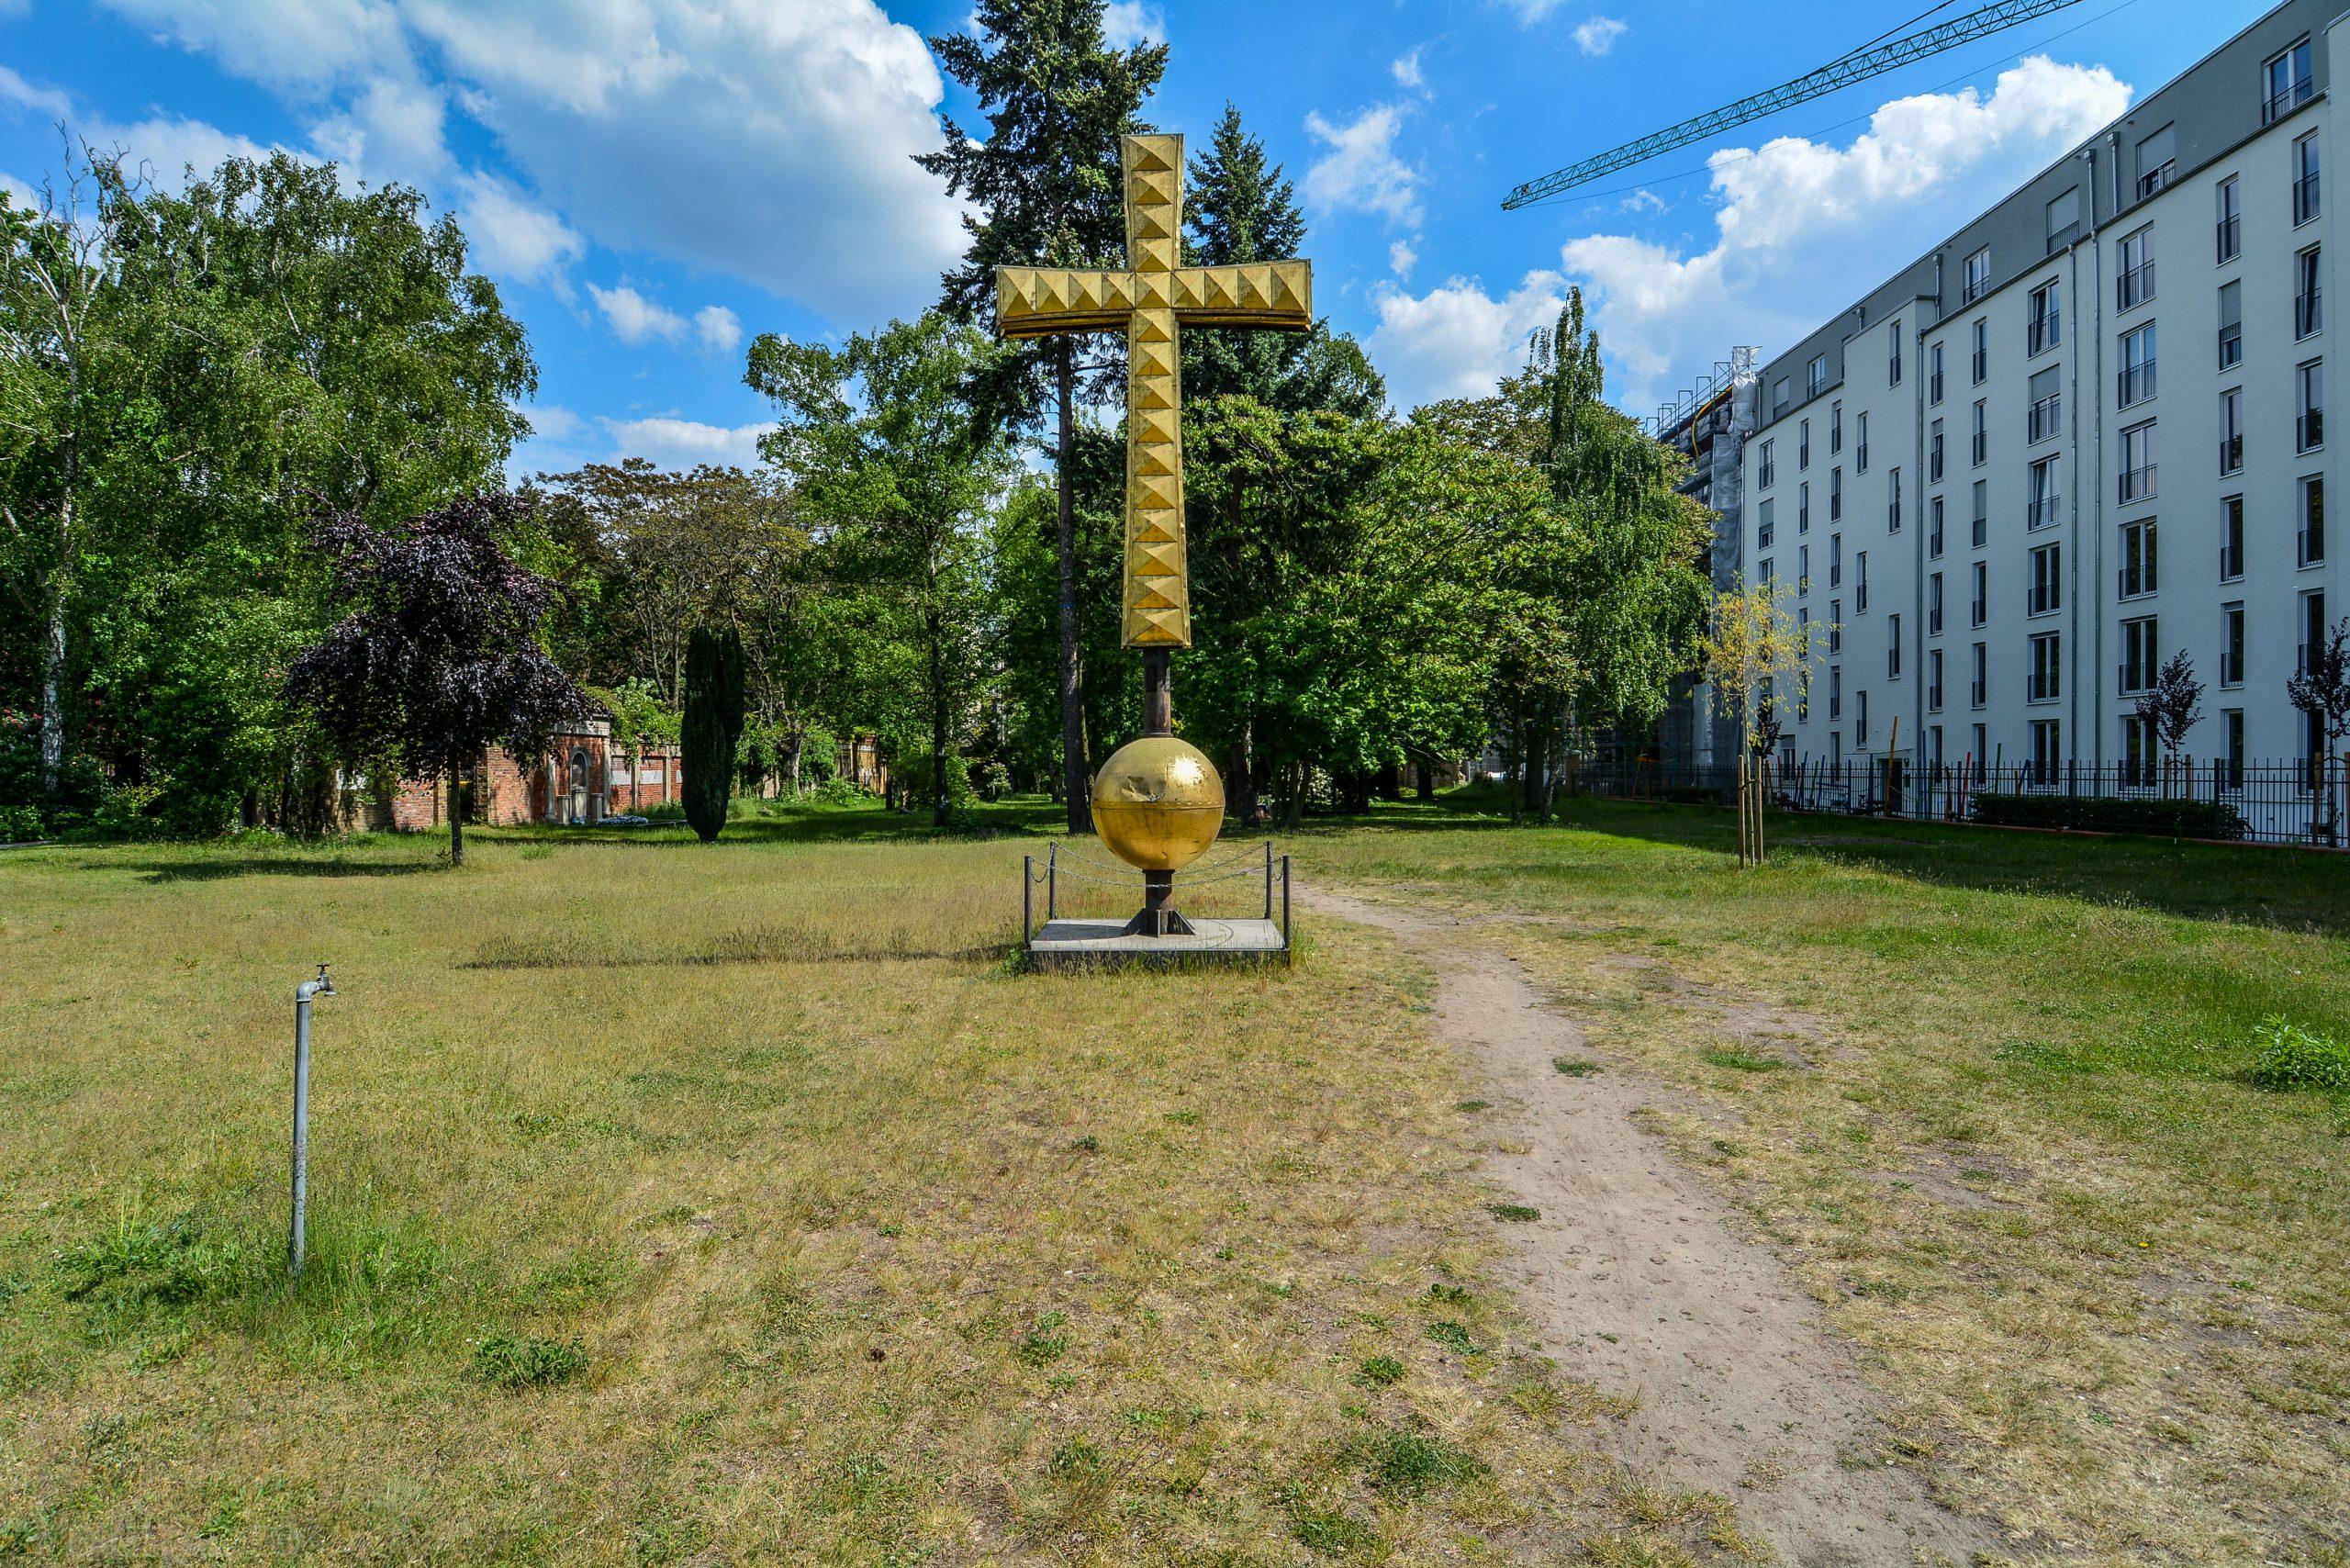 eingang domfriedhof kuppelkreuz berlin kuppelkreuz berliner dom berlin cathedral church cross st hedwig friedhof cemetery domfriedhof